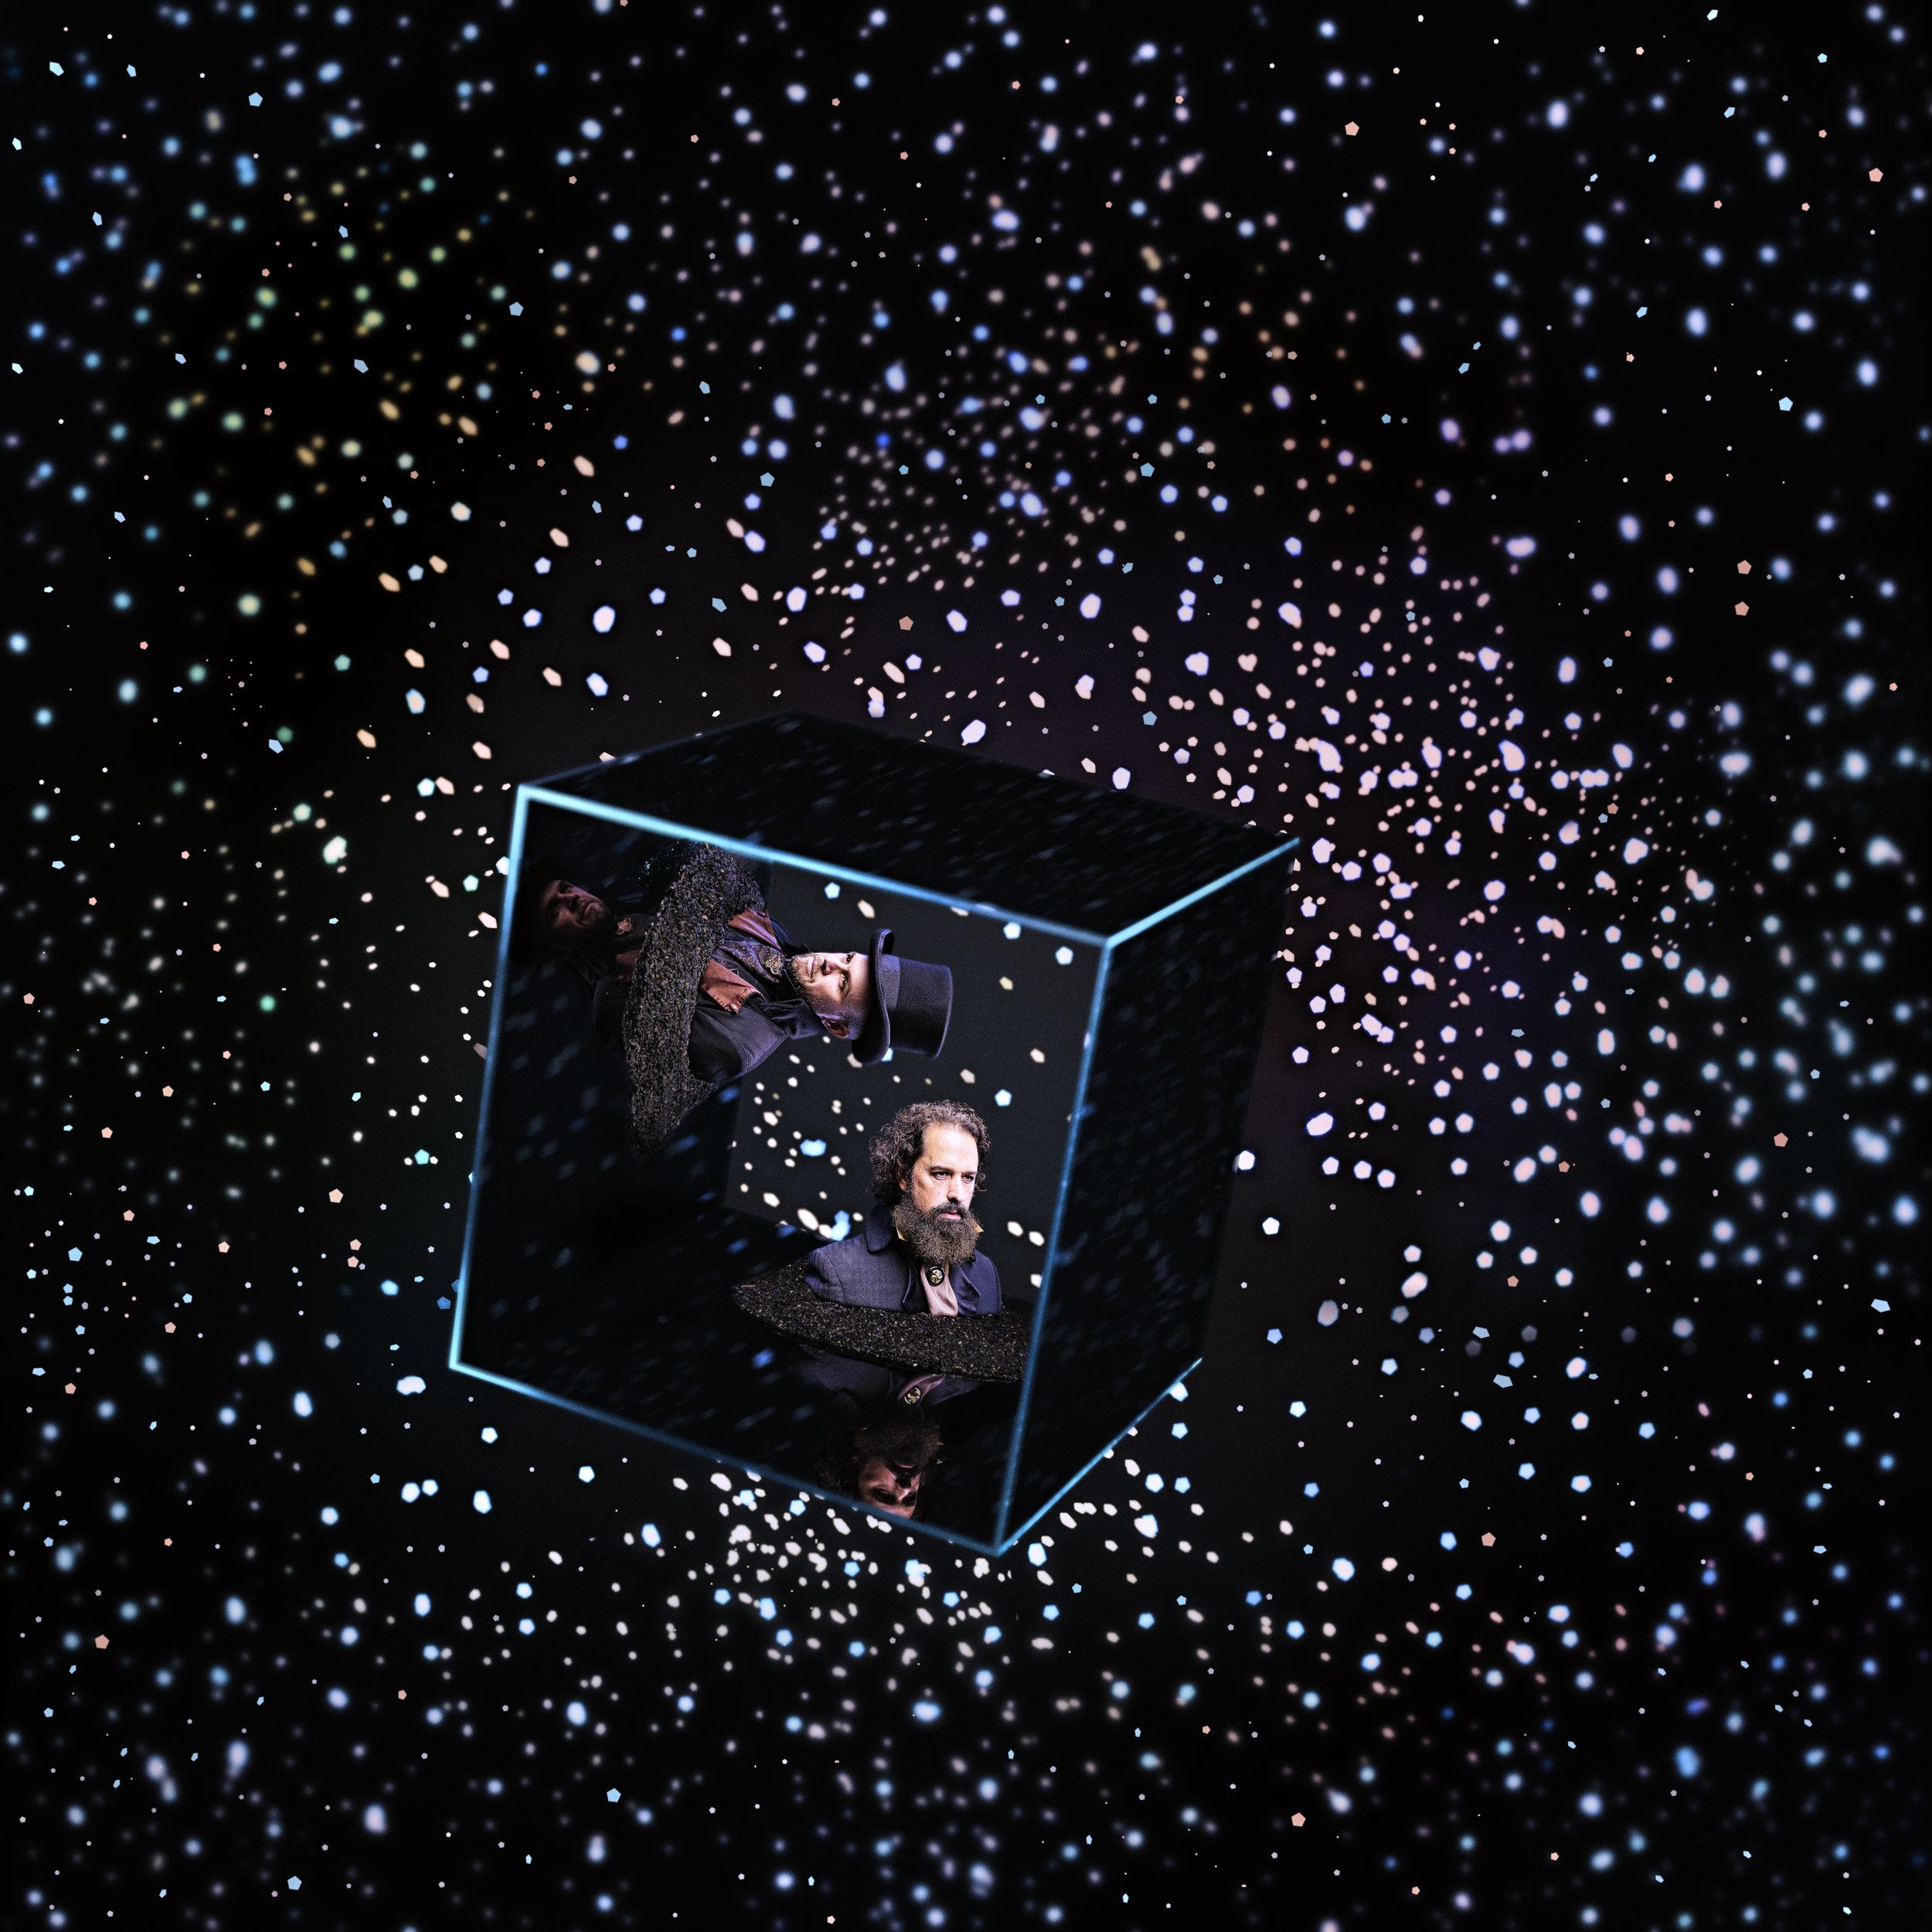 Evership_Space_Heads_FINAL_V4_STAR_FILL.jpg